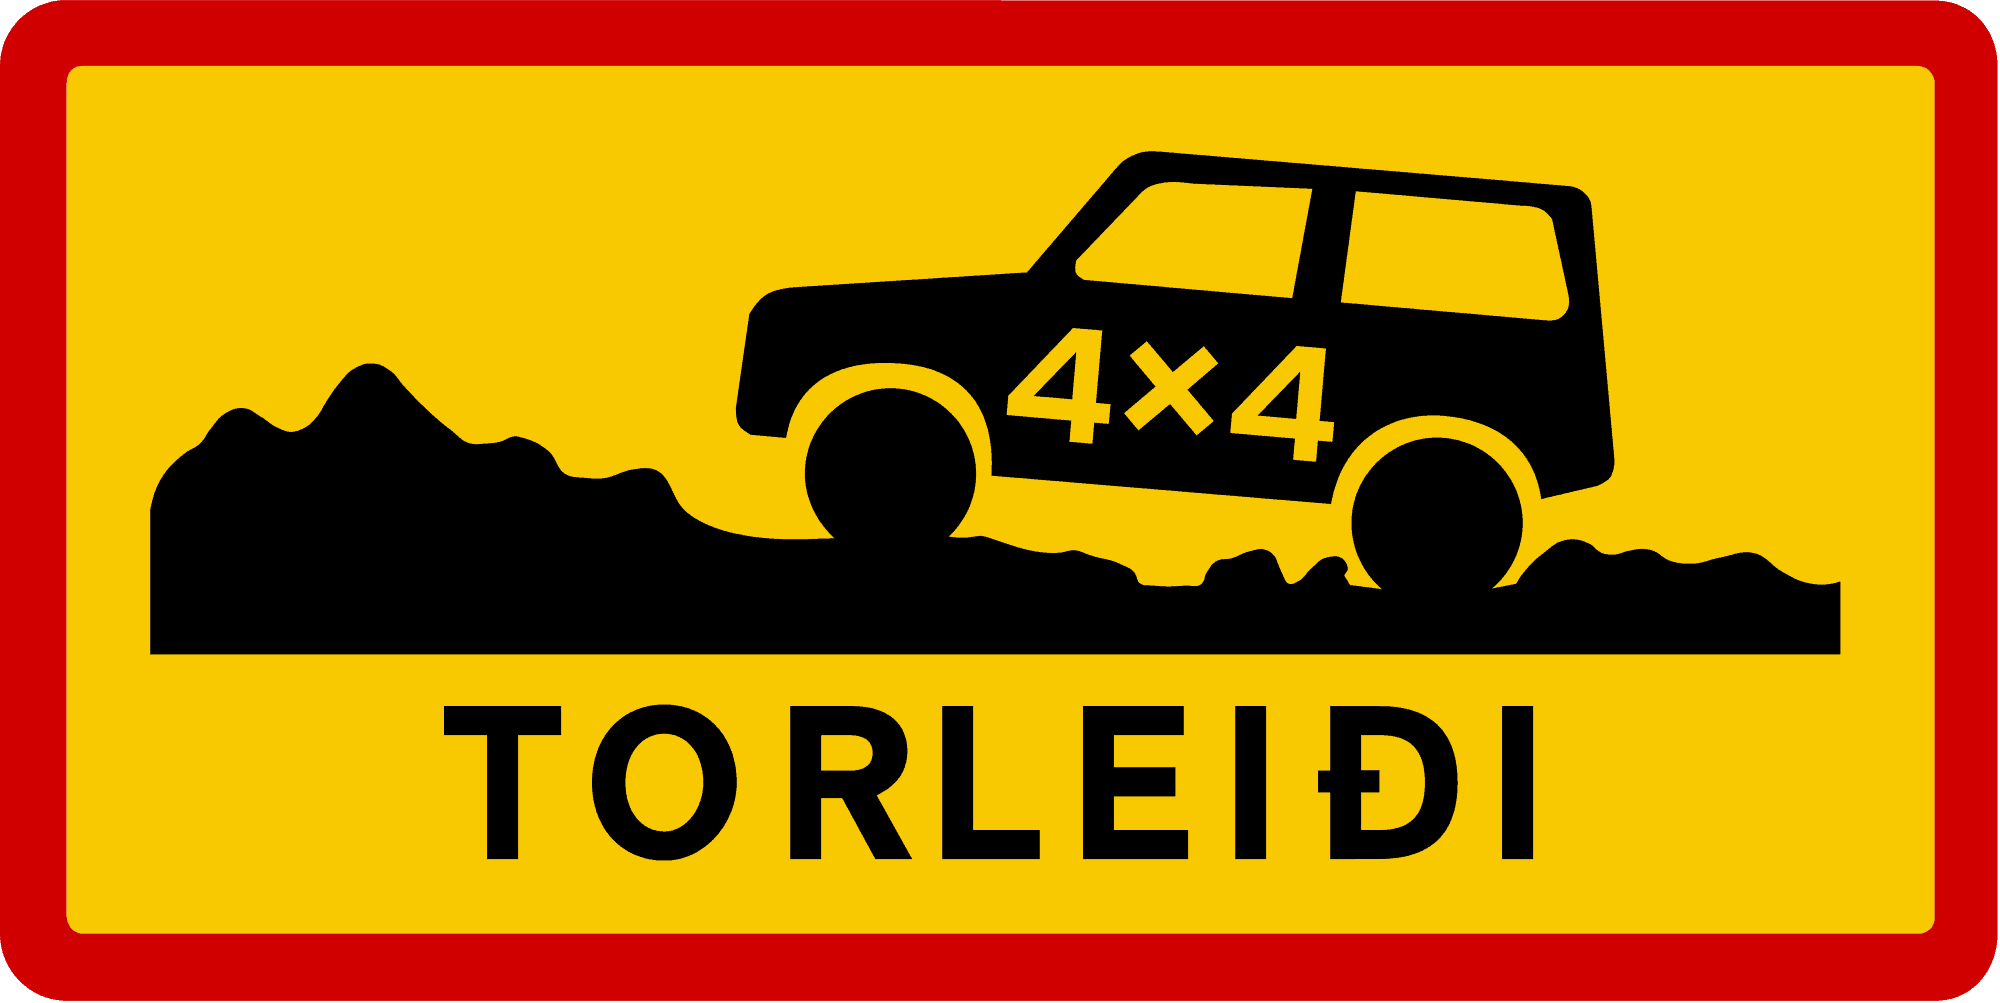 Iceland road sign Torleidi on F-roads